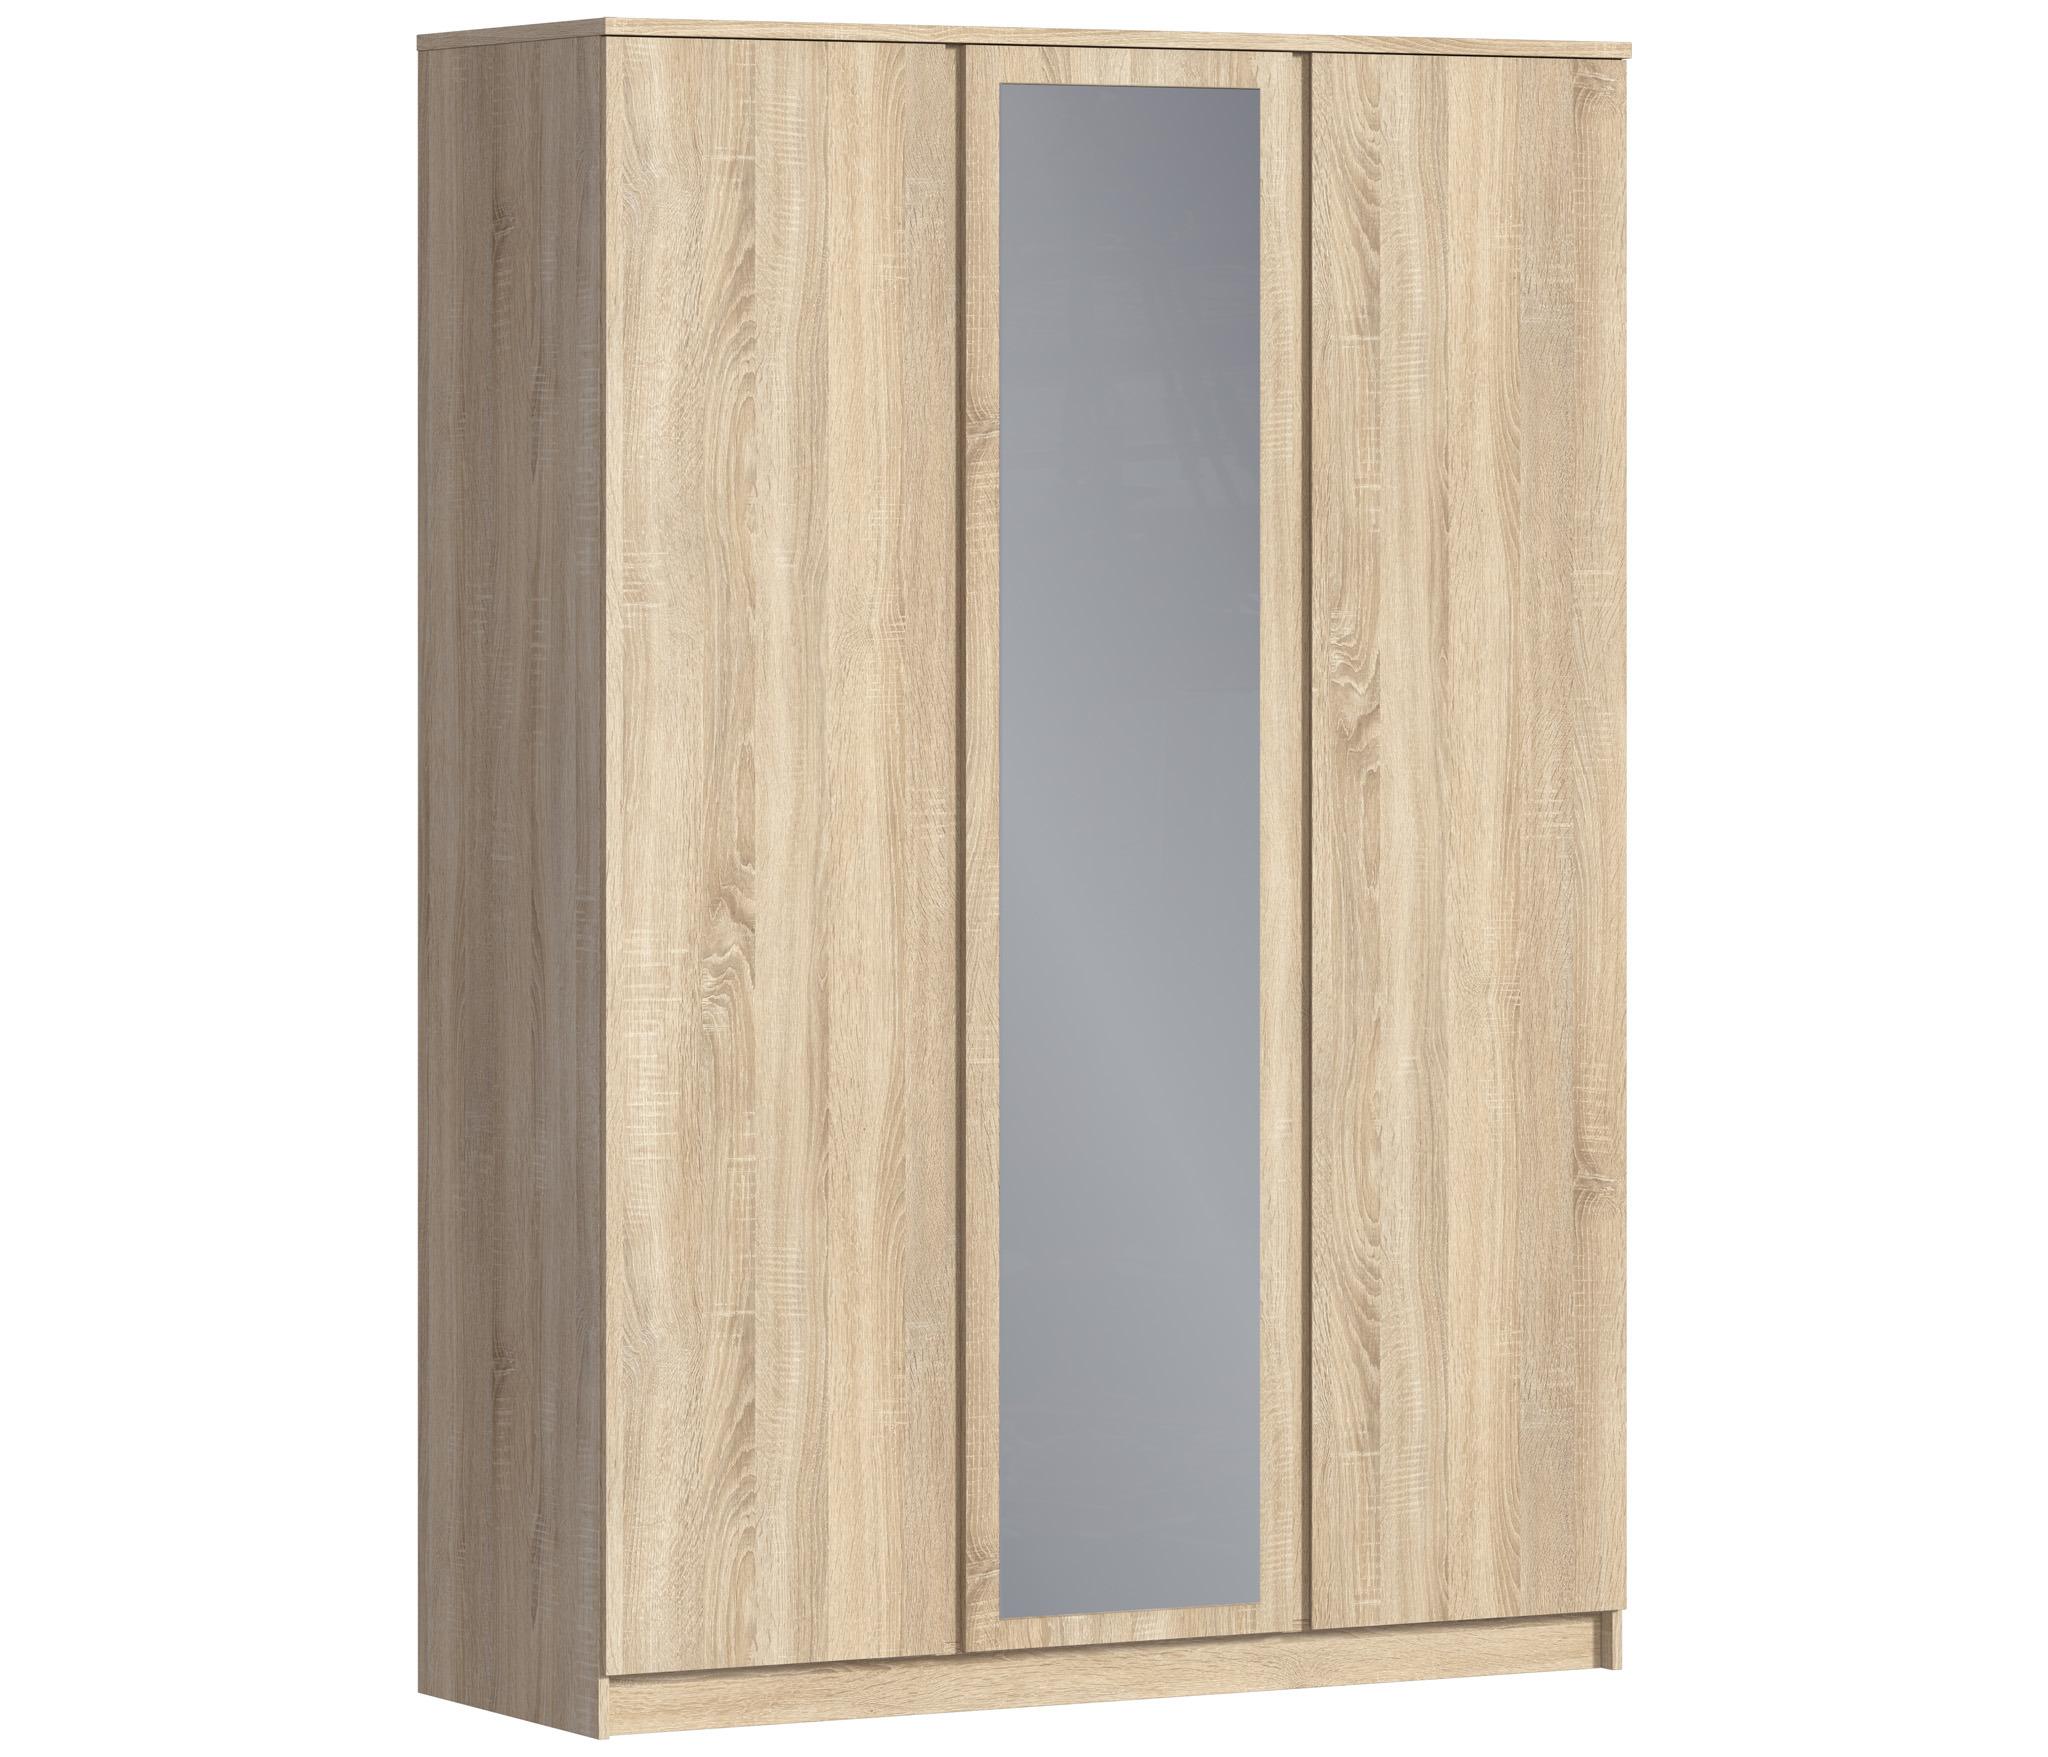 Веста СБ-2258 Шкаф 3-х дверныйШкафы<br>